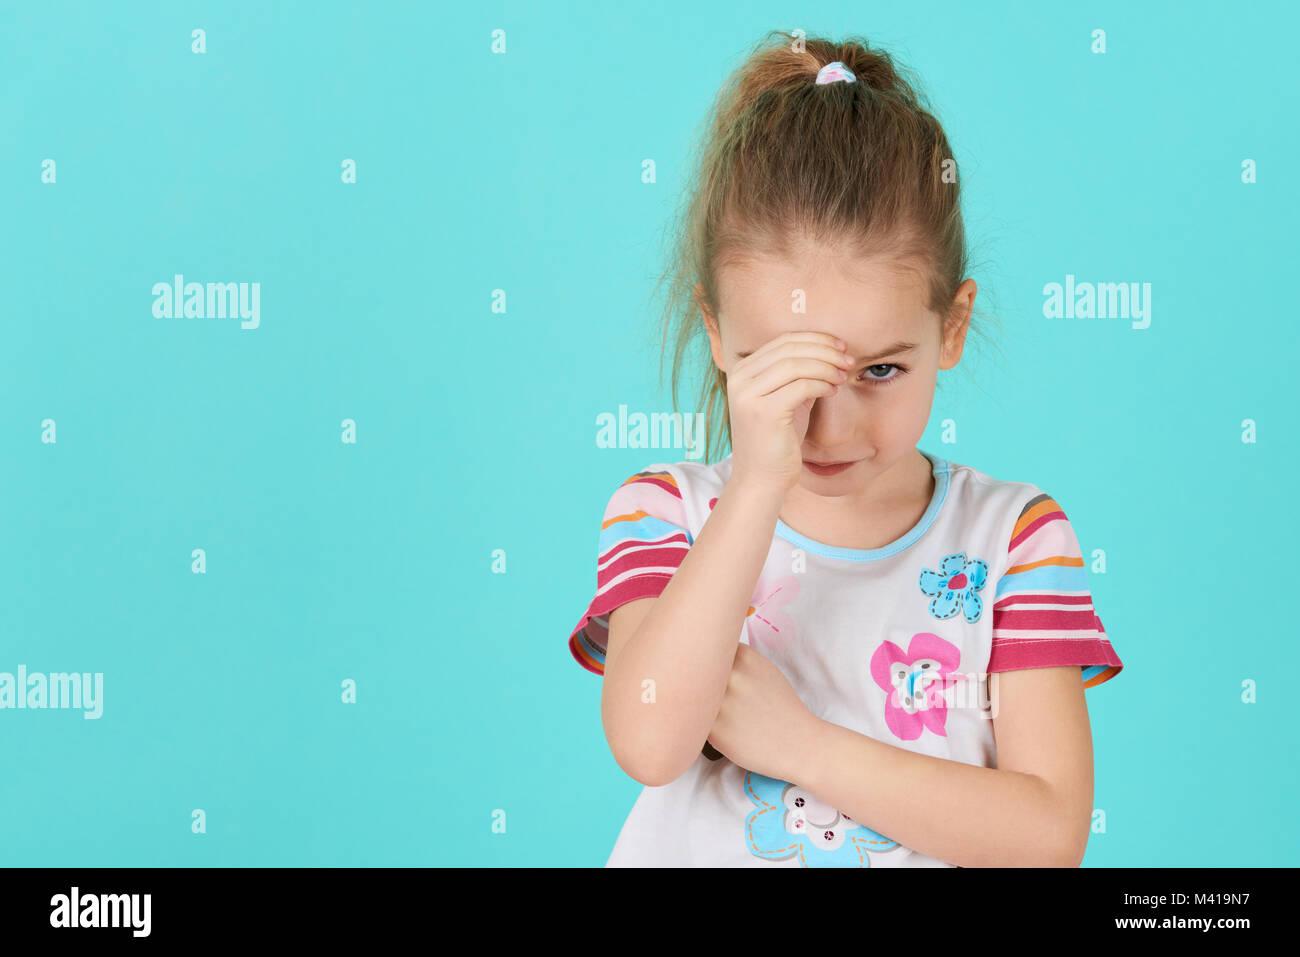 Verärgert problem Kind mit Kopf in den Händen. Mobbing, Depressionen, Stress oder Frustration Konzept. Stockbild